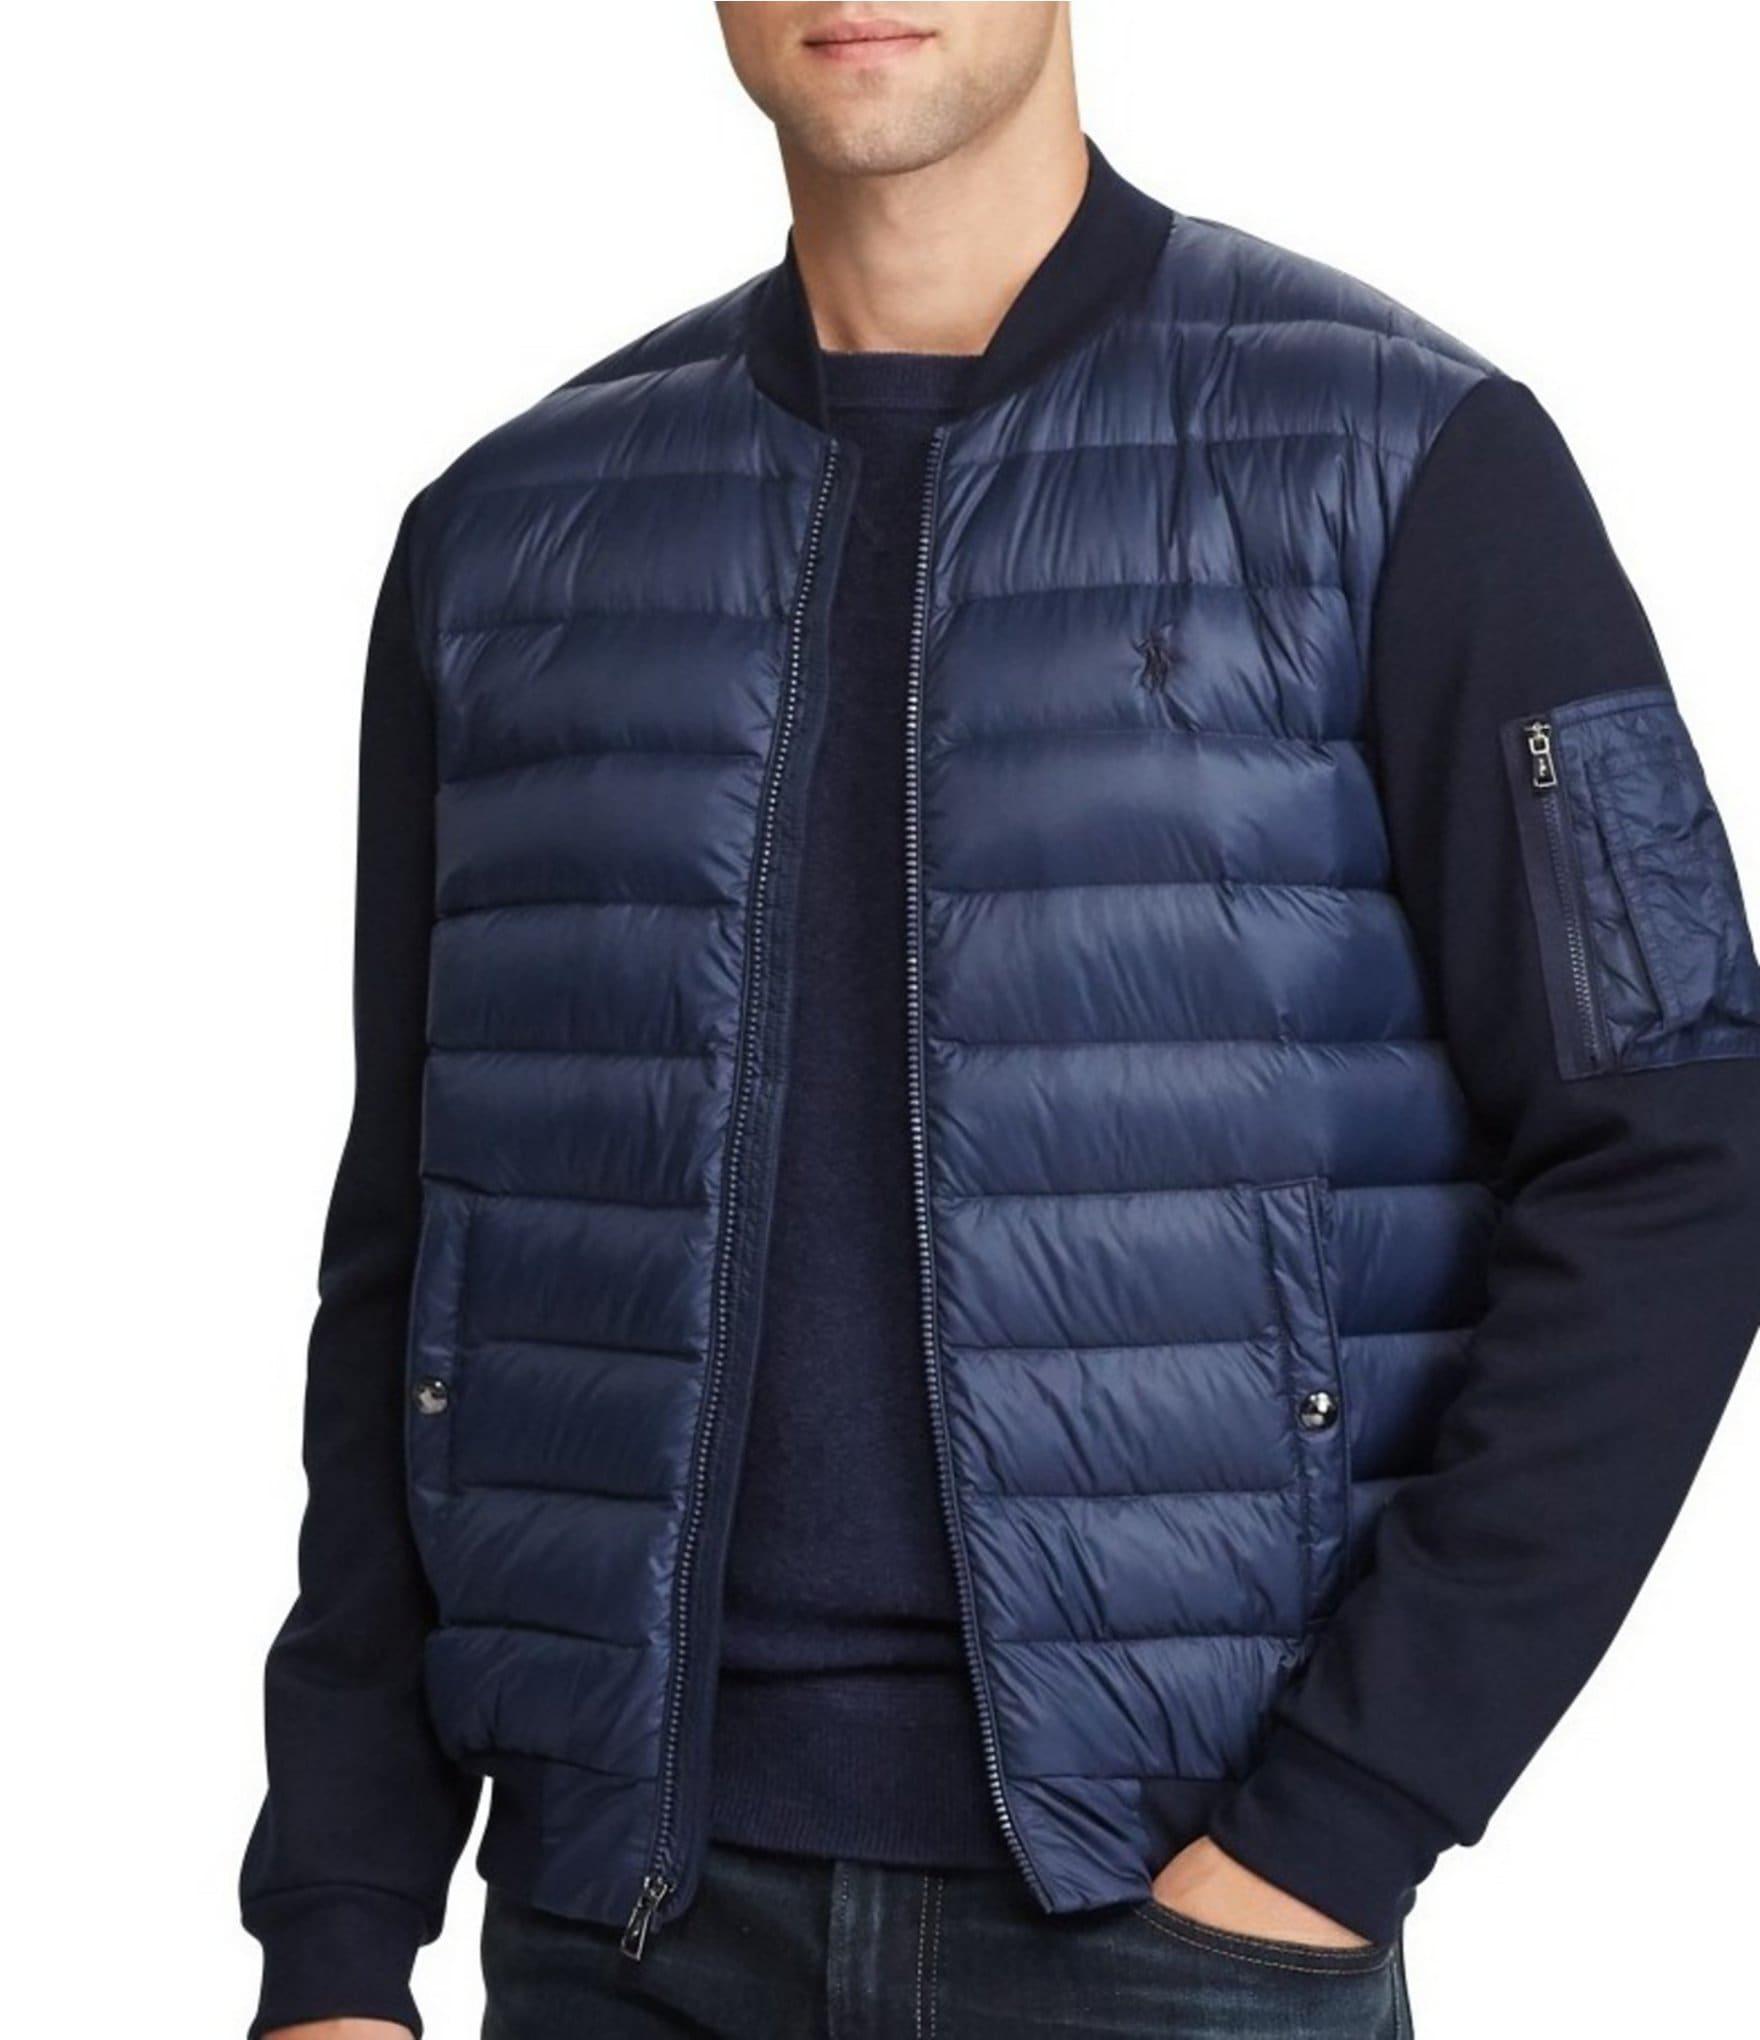 polo ralph lauren paneled down hybrid bomber jacket dillards. Black Bedroom Furniture Sets. Home Design Ideas